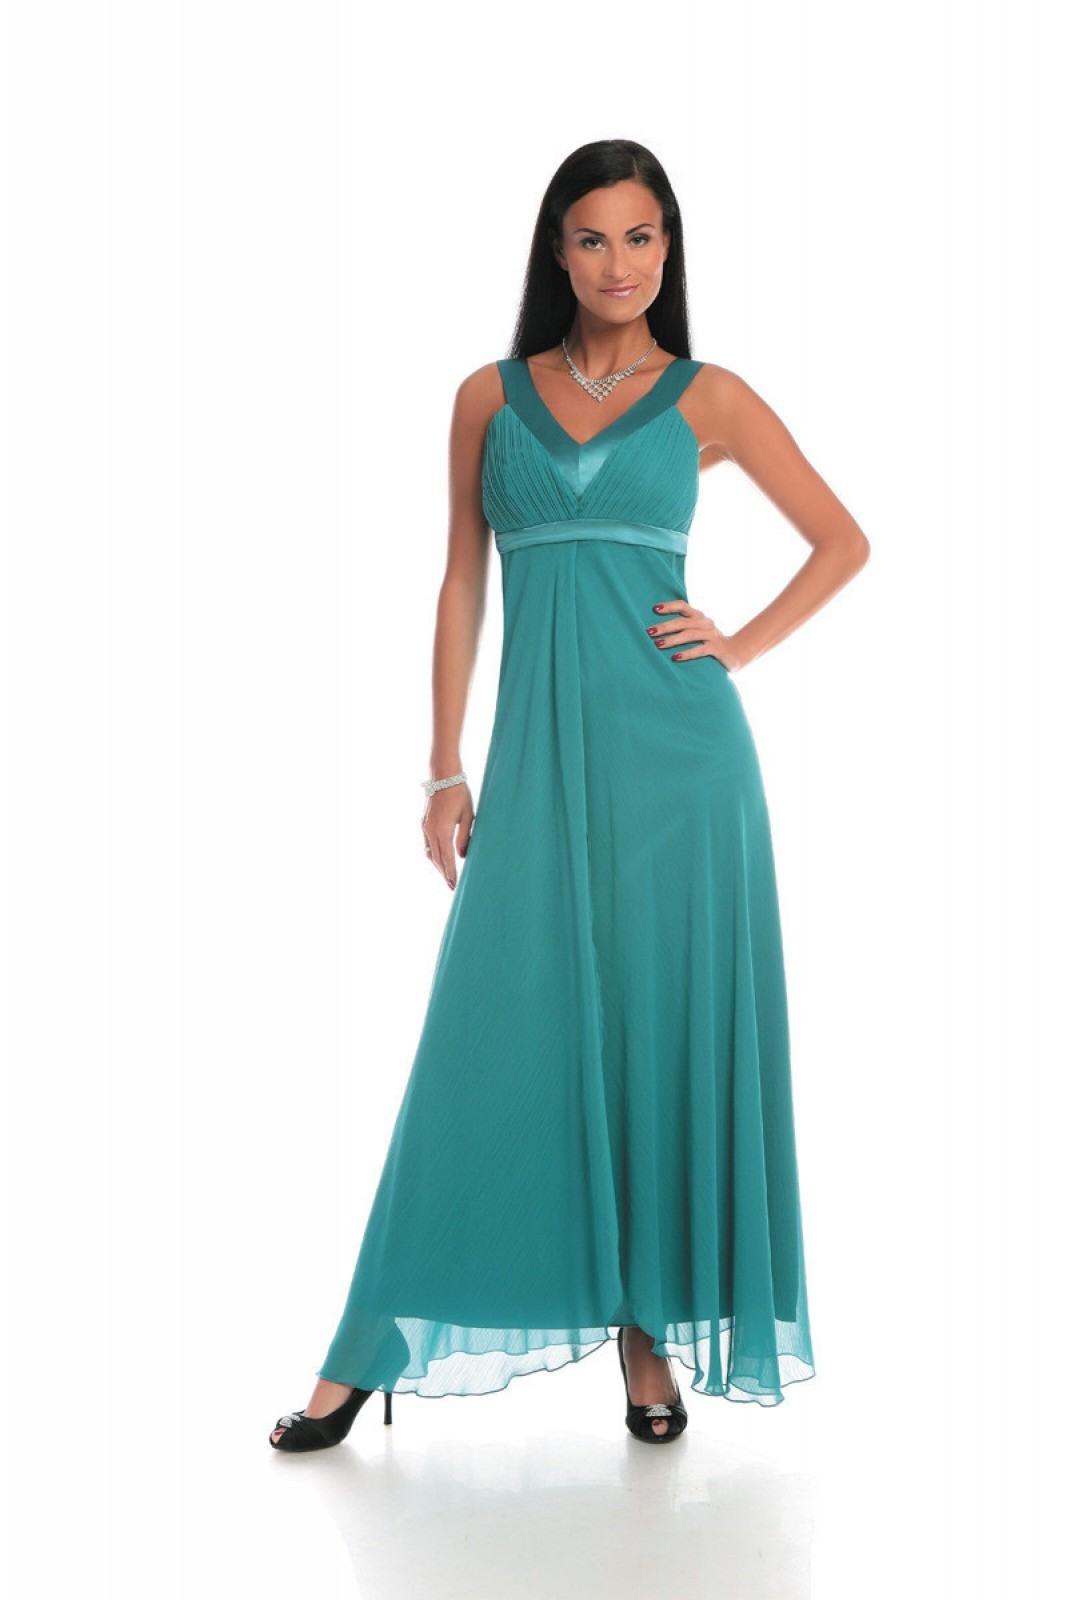 Designer Fantastisch Langes Kleid Türkis Ärmel13 Elegant Langes Kleid Türkis Spezialgebiet